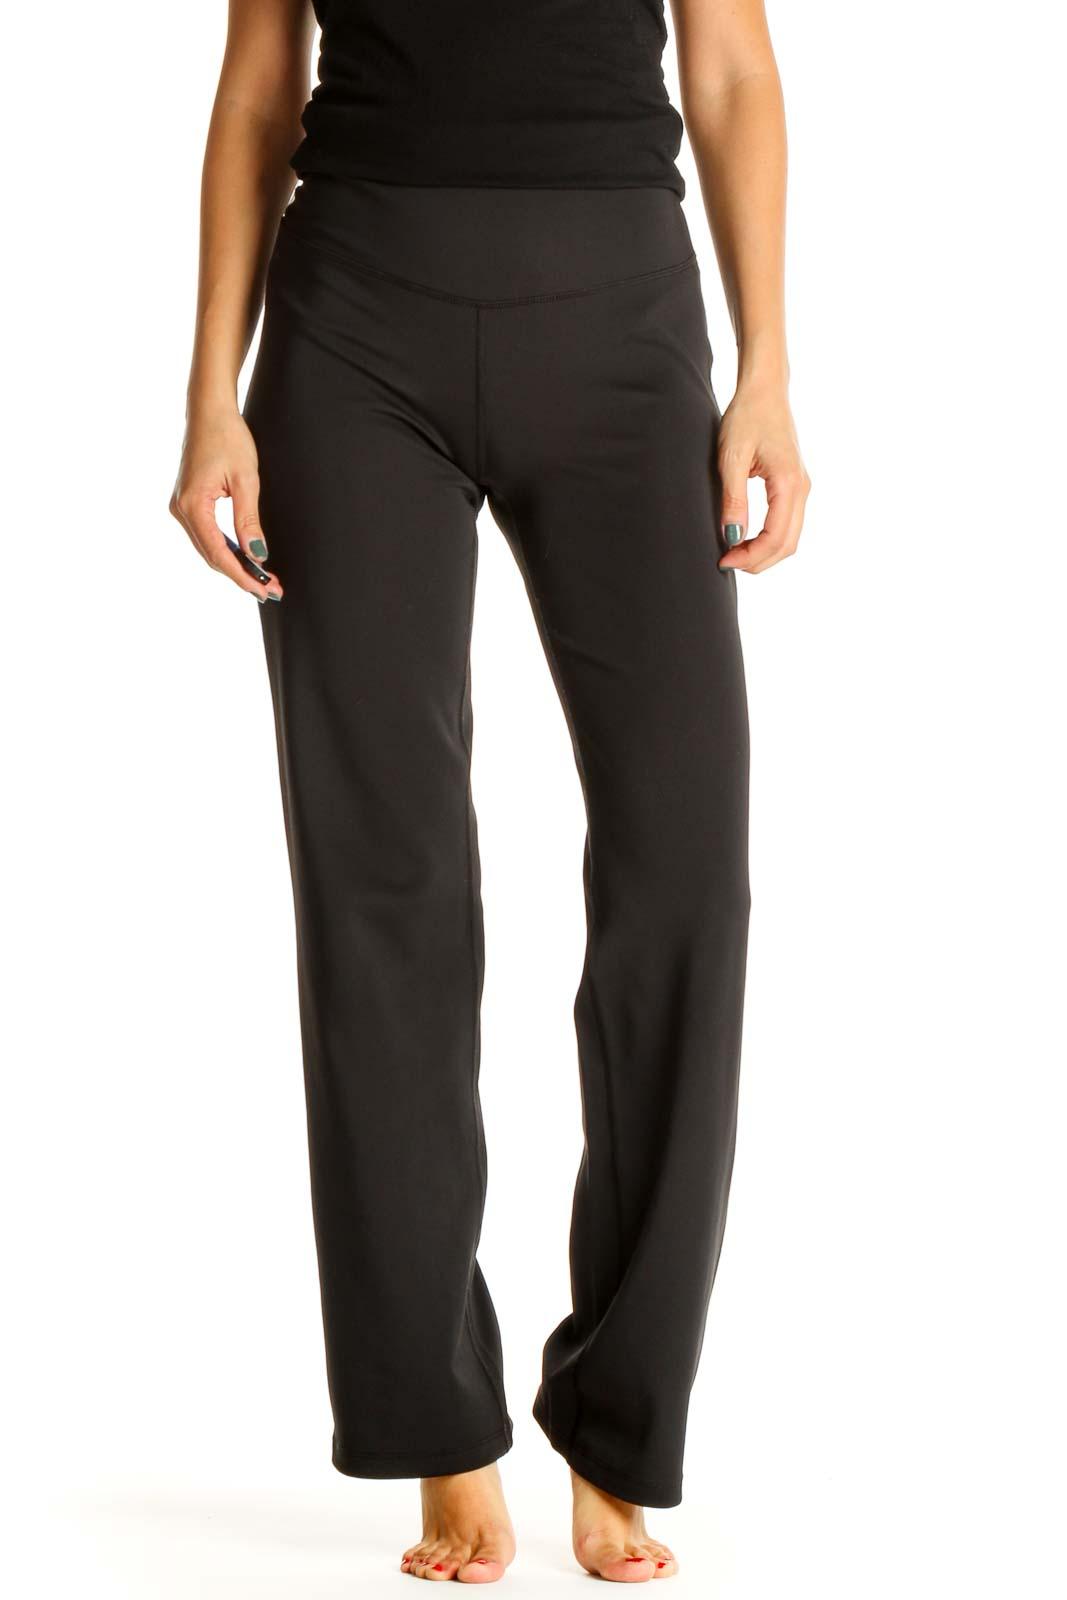 Black Activewear Sweatpants Front